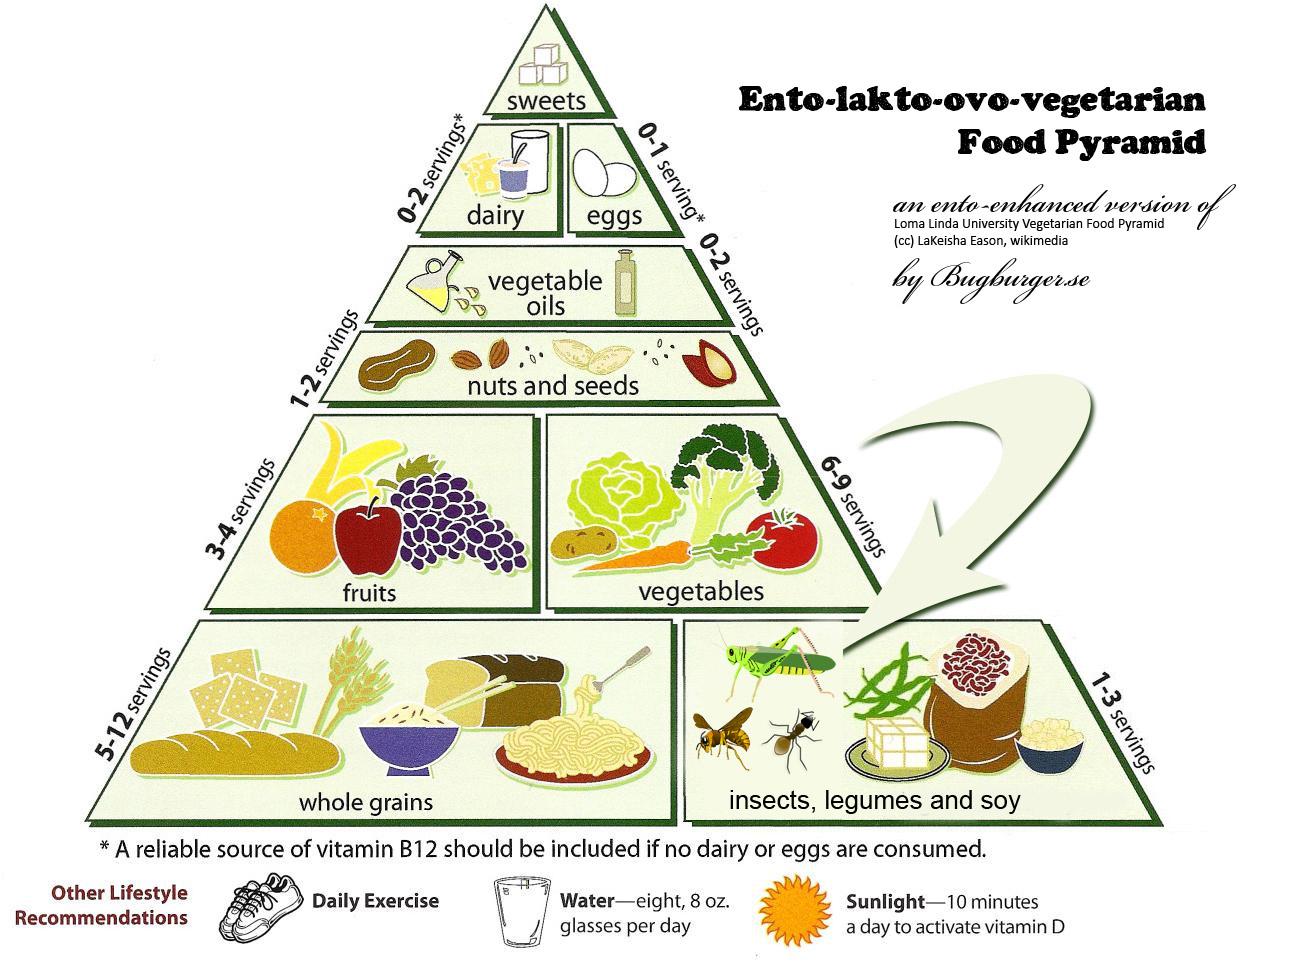 Ento-lacto-ovo-vegetarian